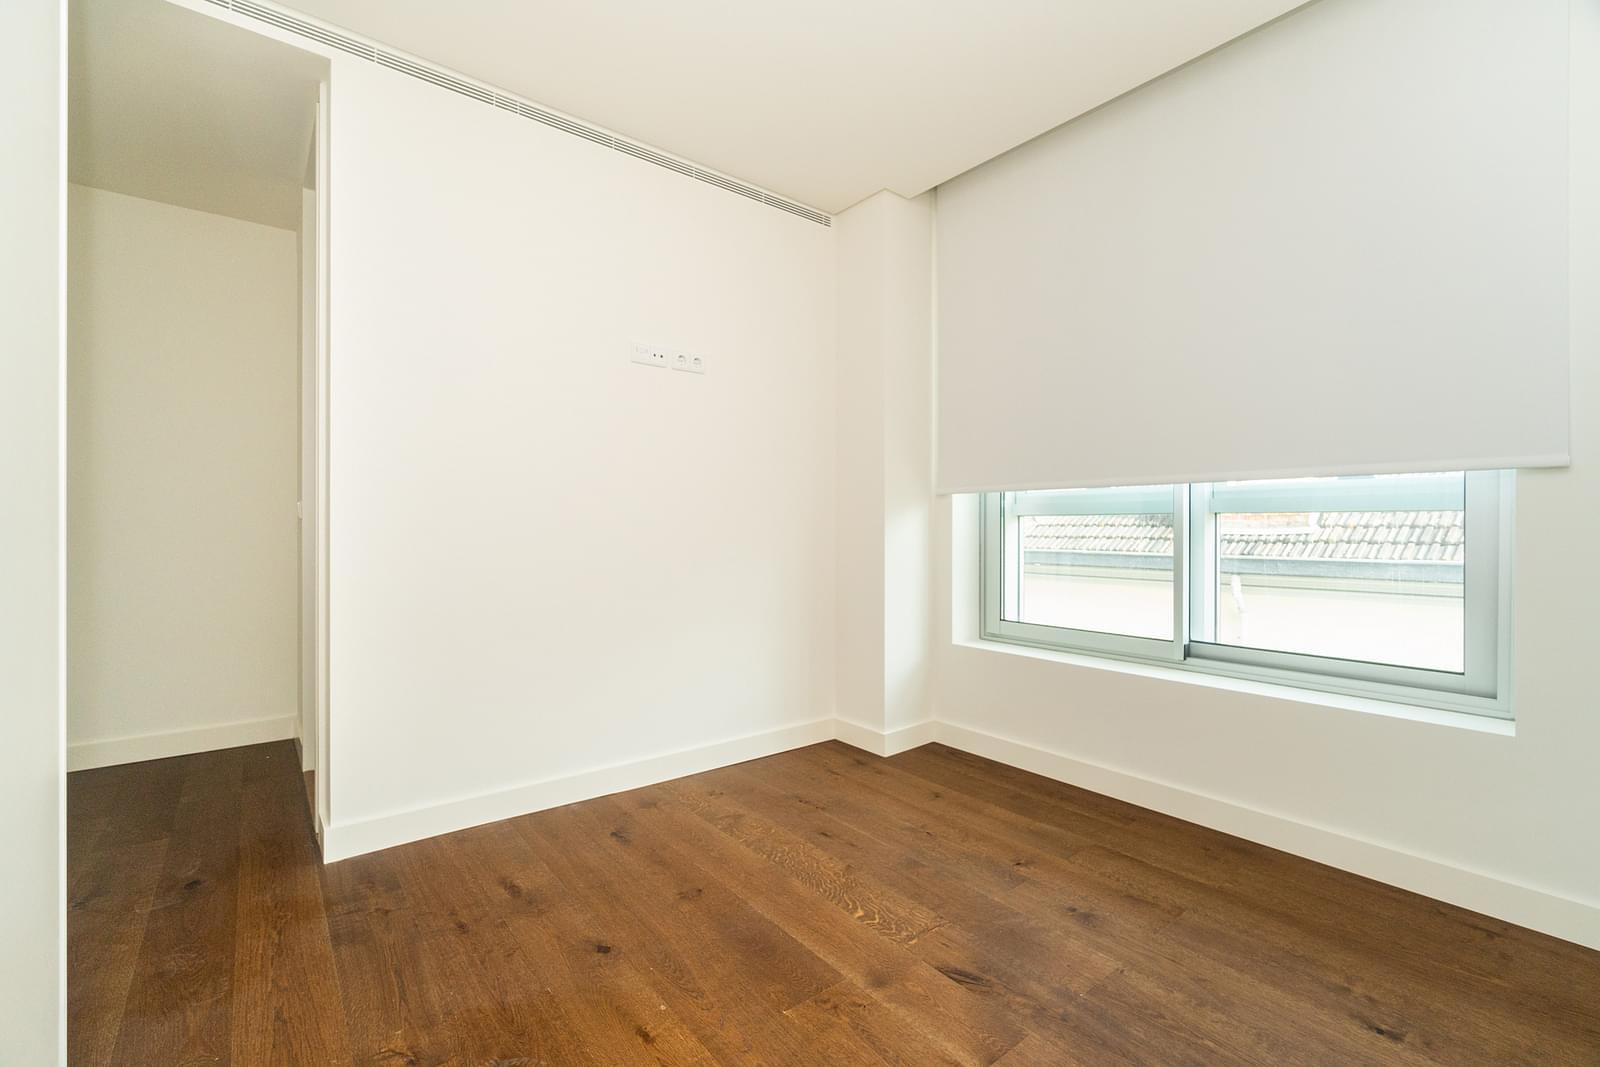 pf18694-apartamento-t3-lisboa-bd275e02-4175-439f-88ae-dfab5da6d16e